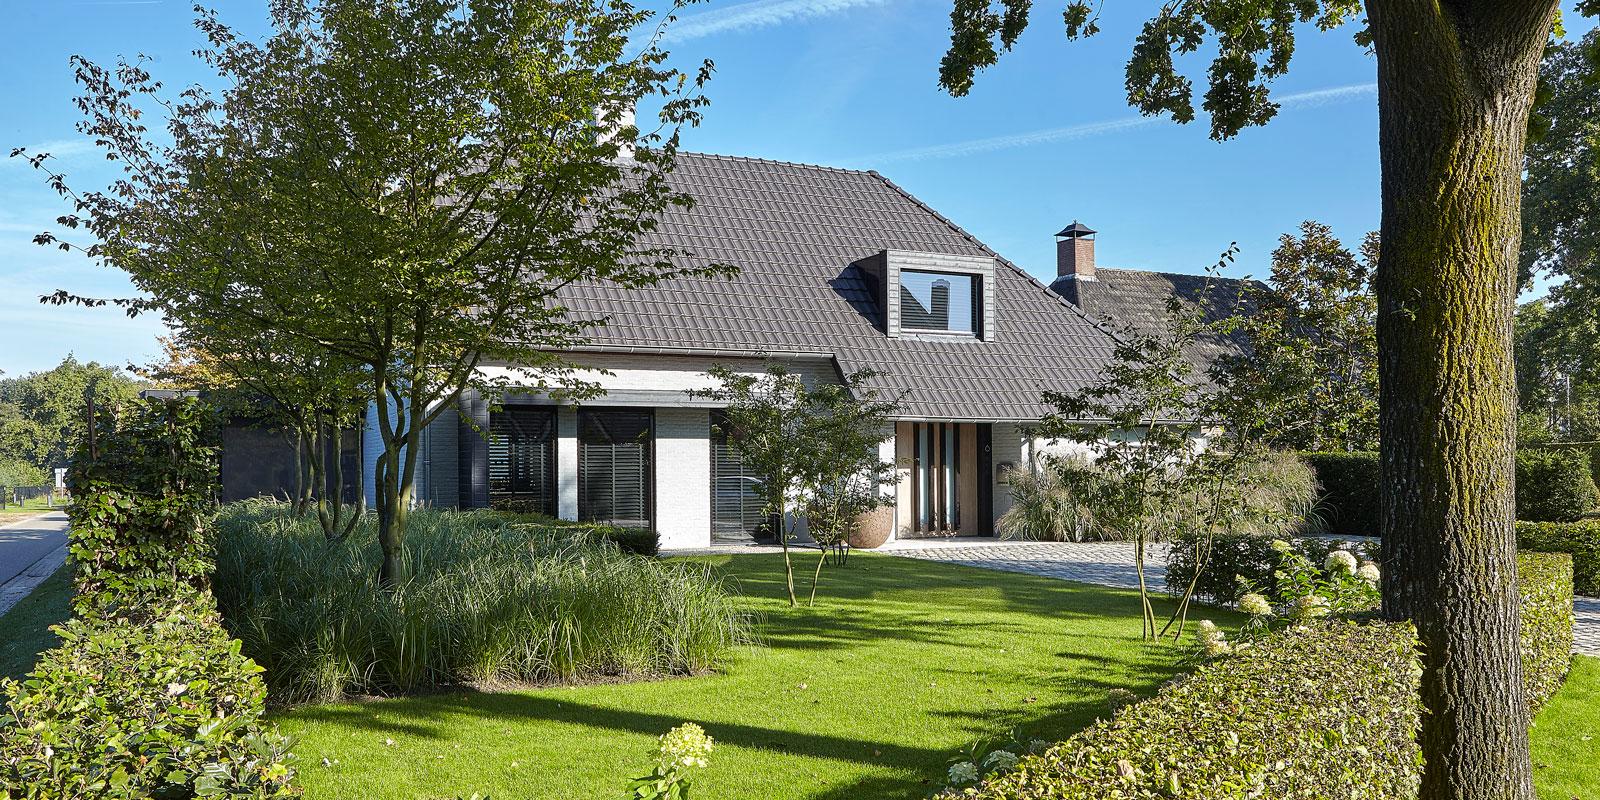 Metamorfose, villa, modern, Bob Manders, tuin, Groenseizoen, ultramodern